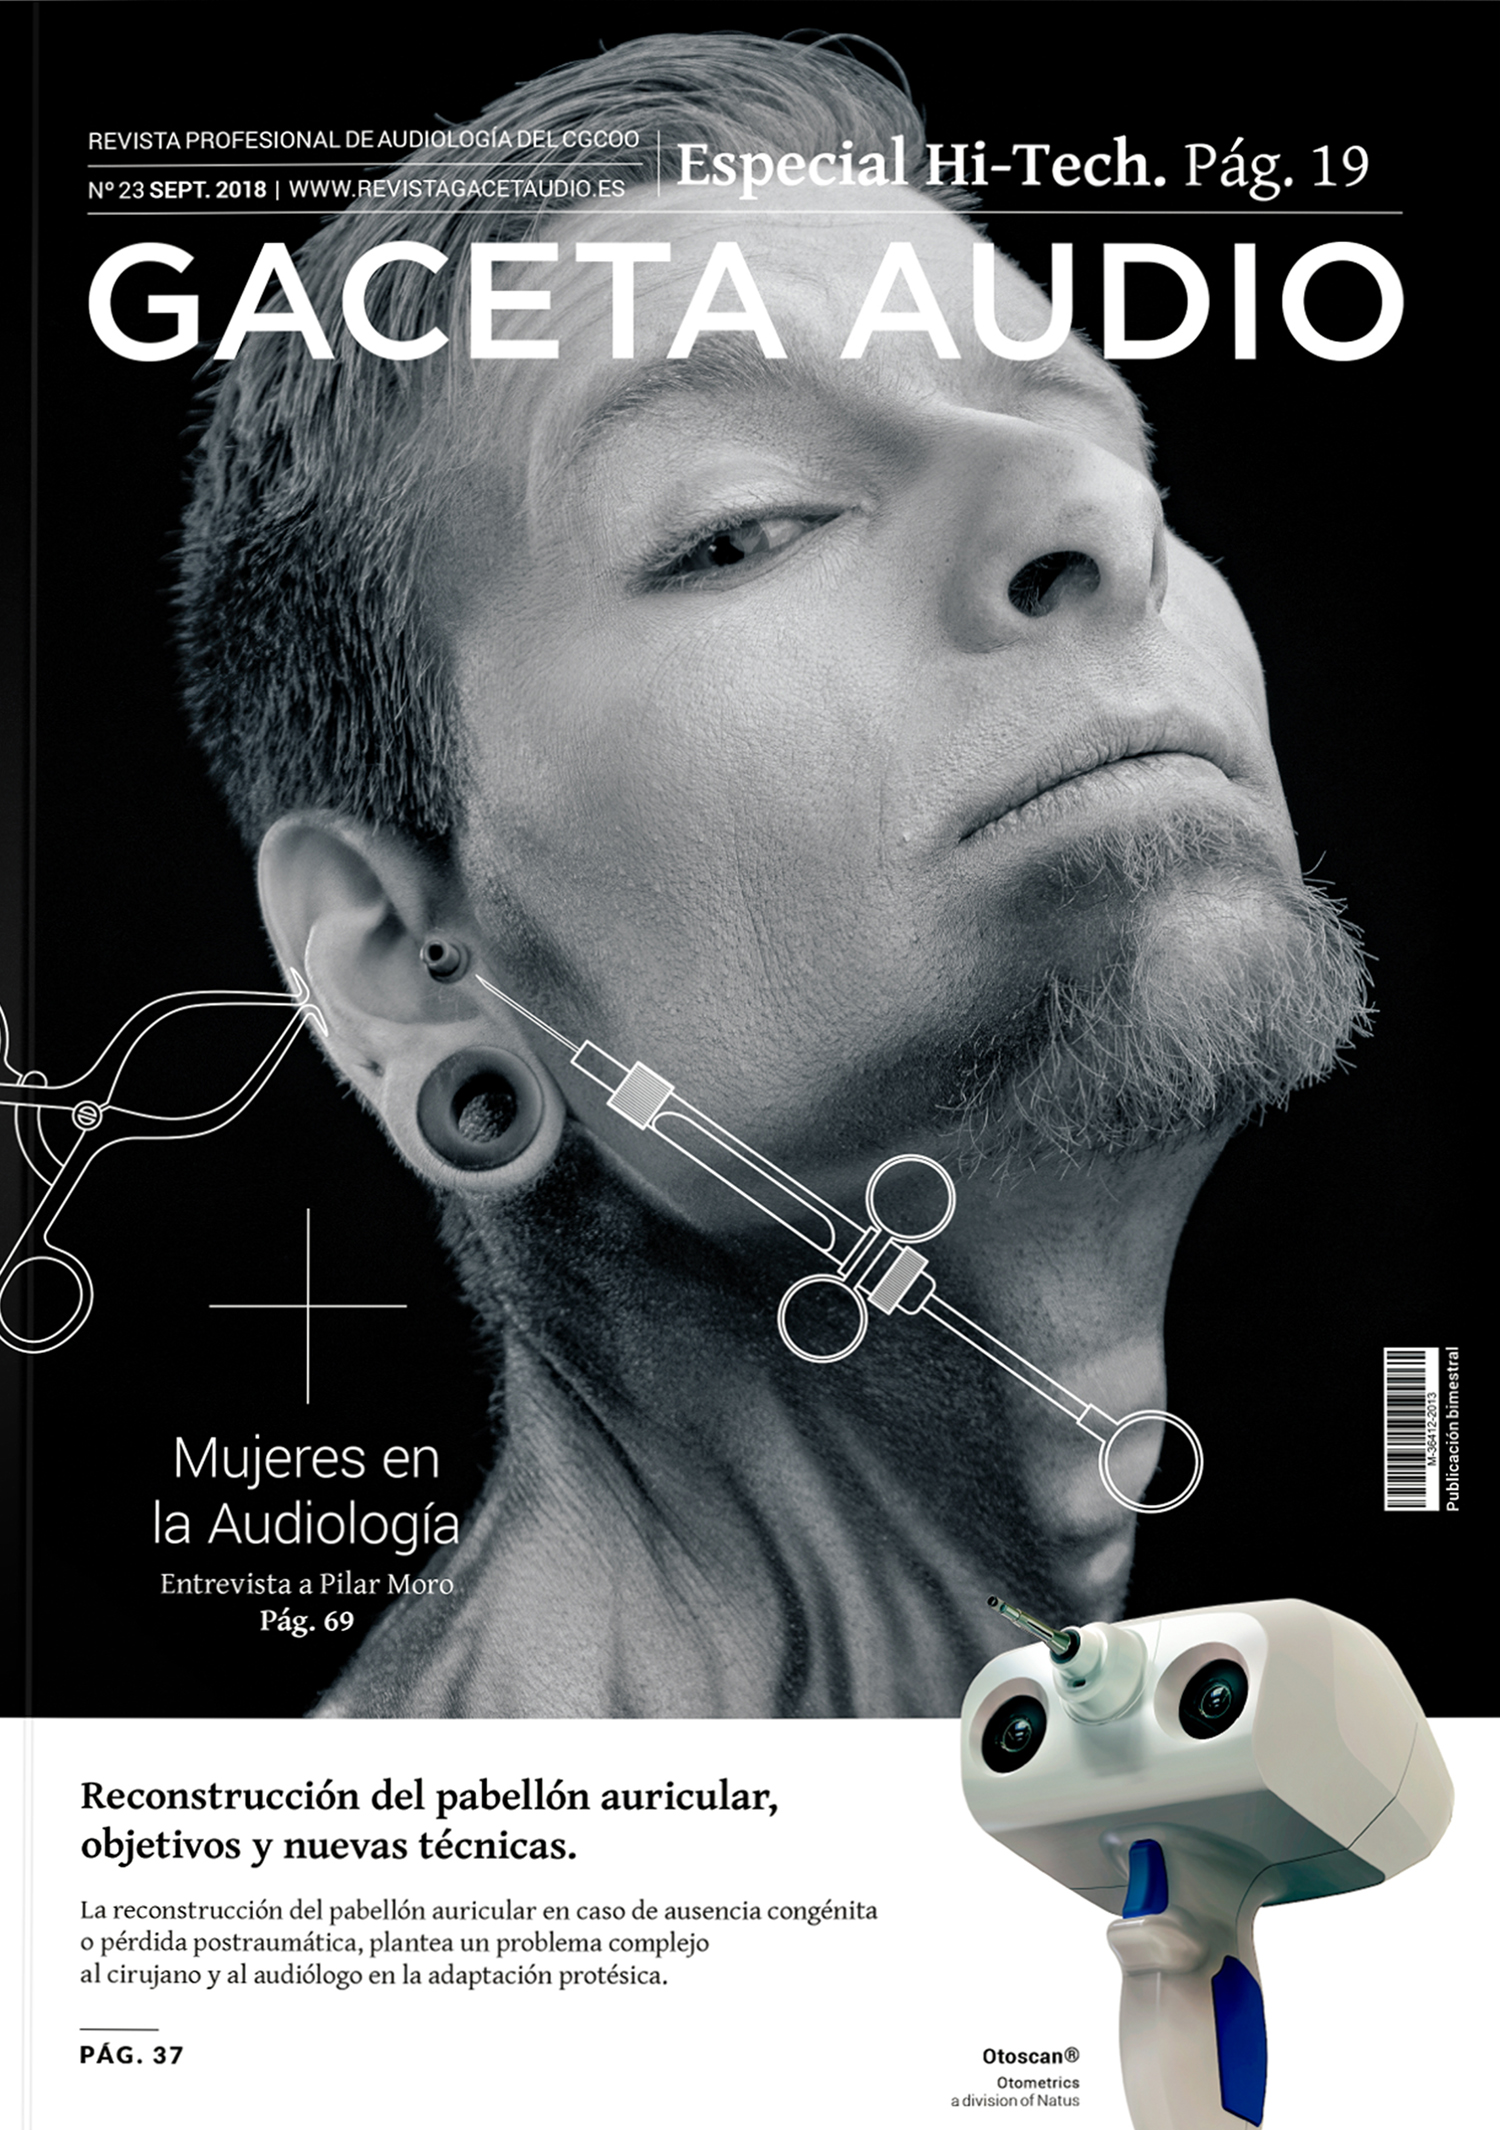 editorial design, Ahmed Alejandro López Martínez